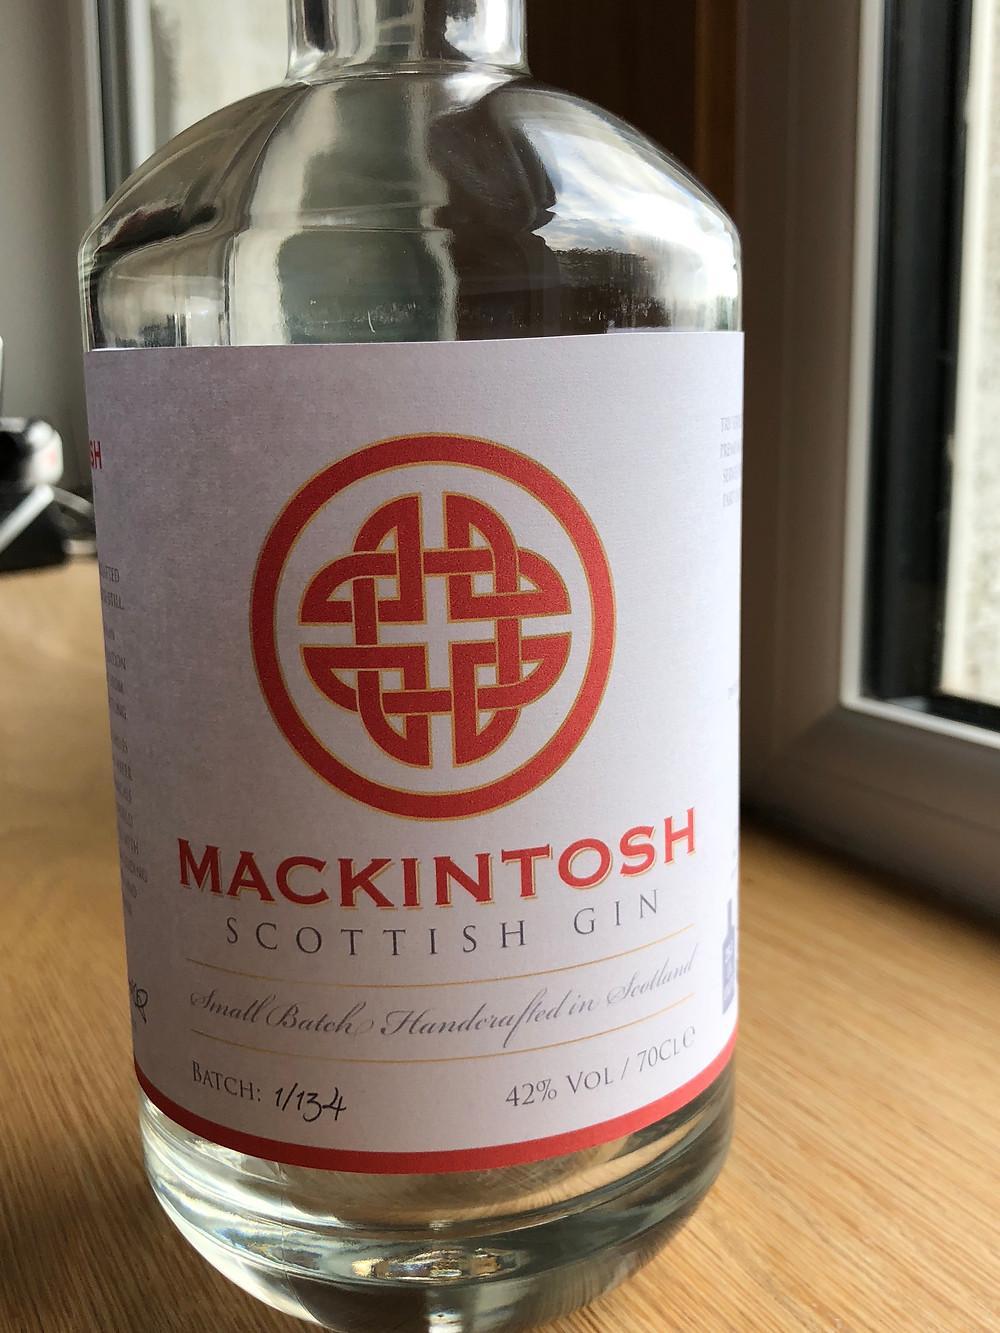 Mackintosh Gin mock up label prior to printing full label